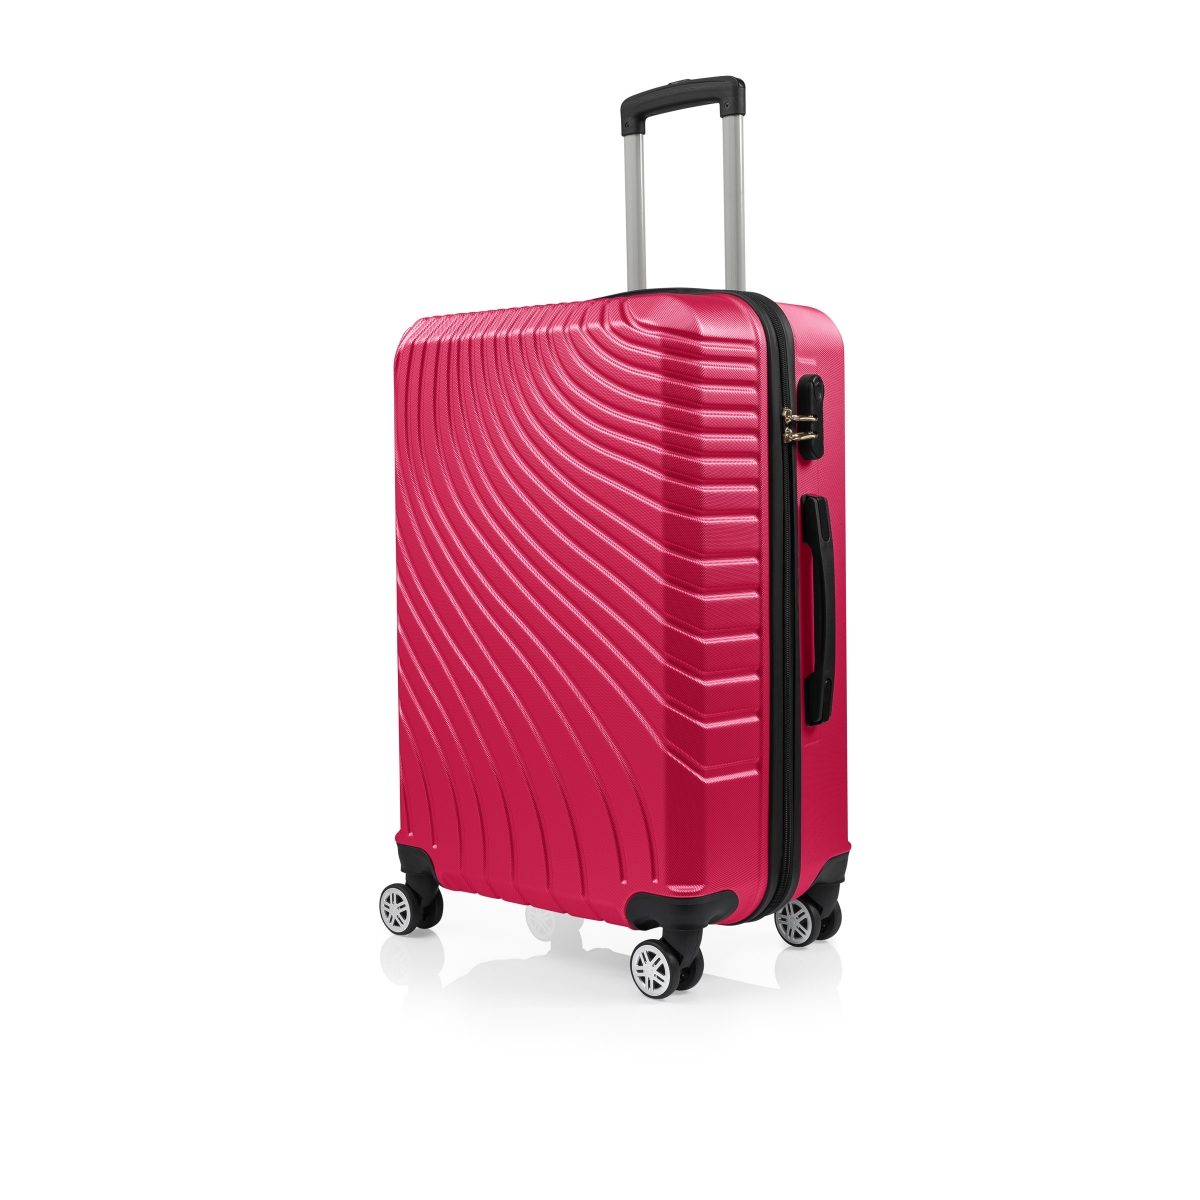 Gedox Abs 3'lü Valiz Seyahat Seti - Model:700.10 Fuşya Pembe